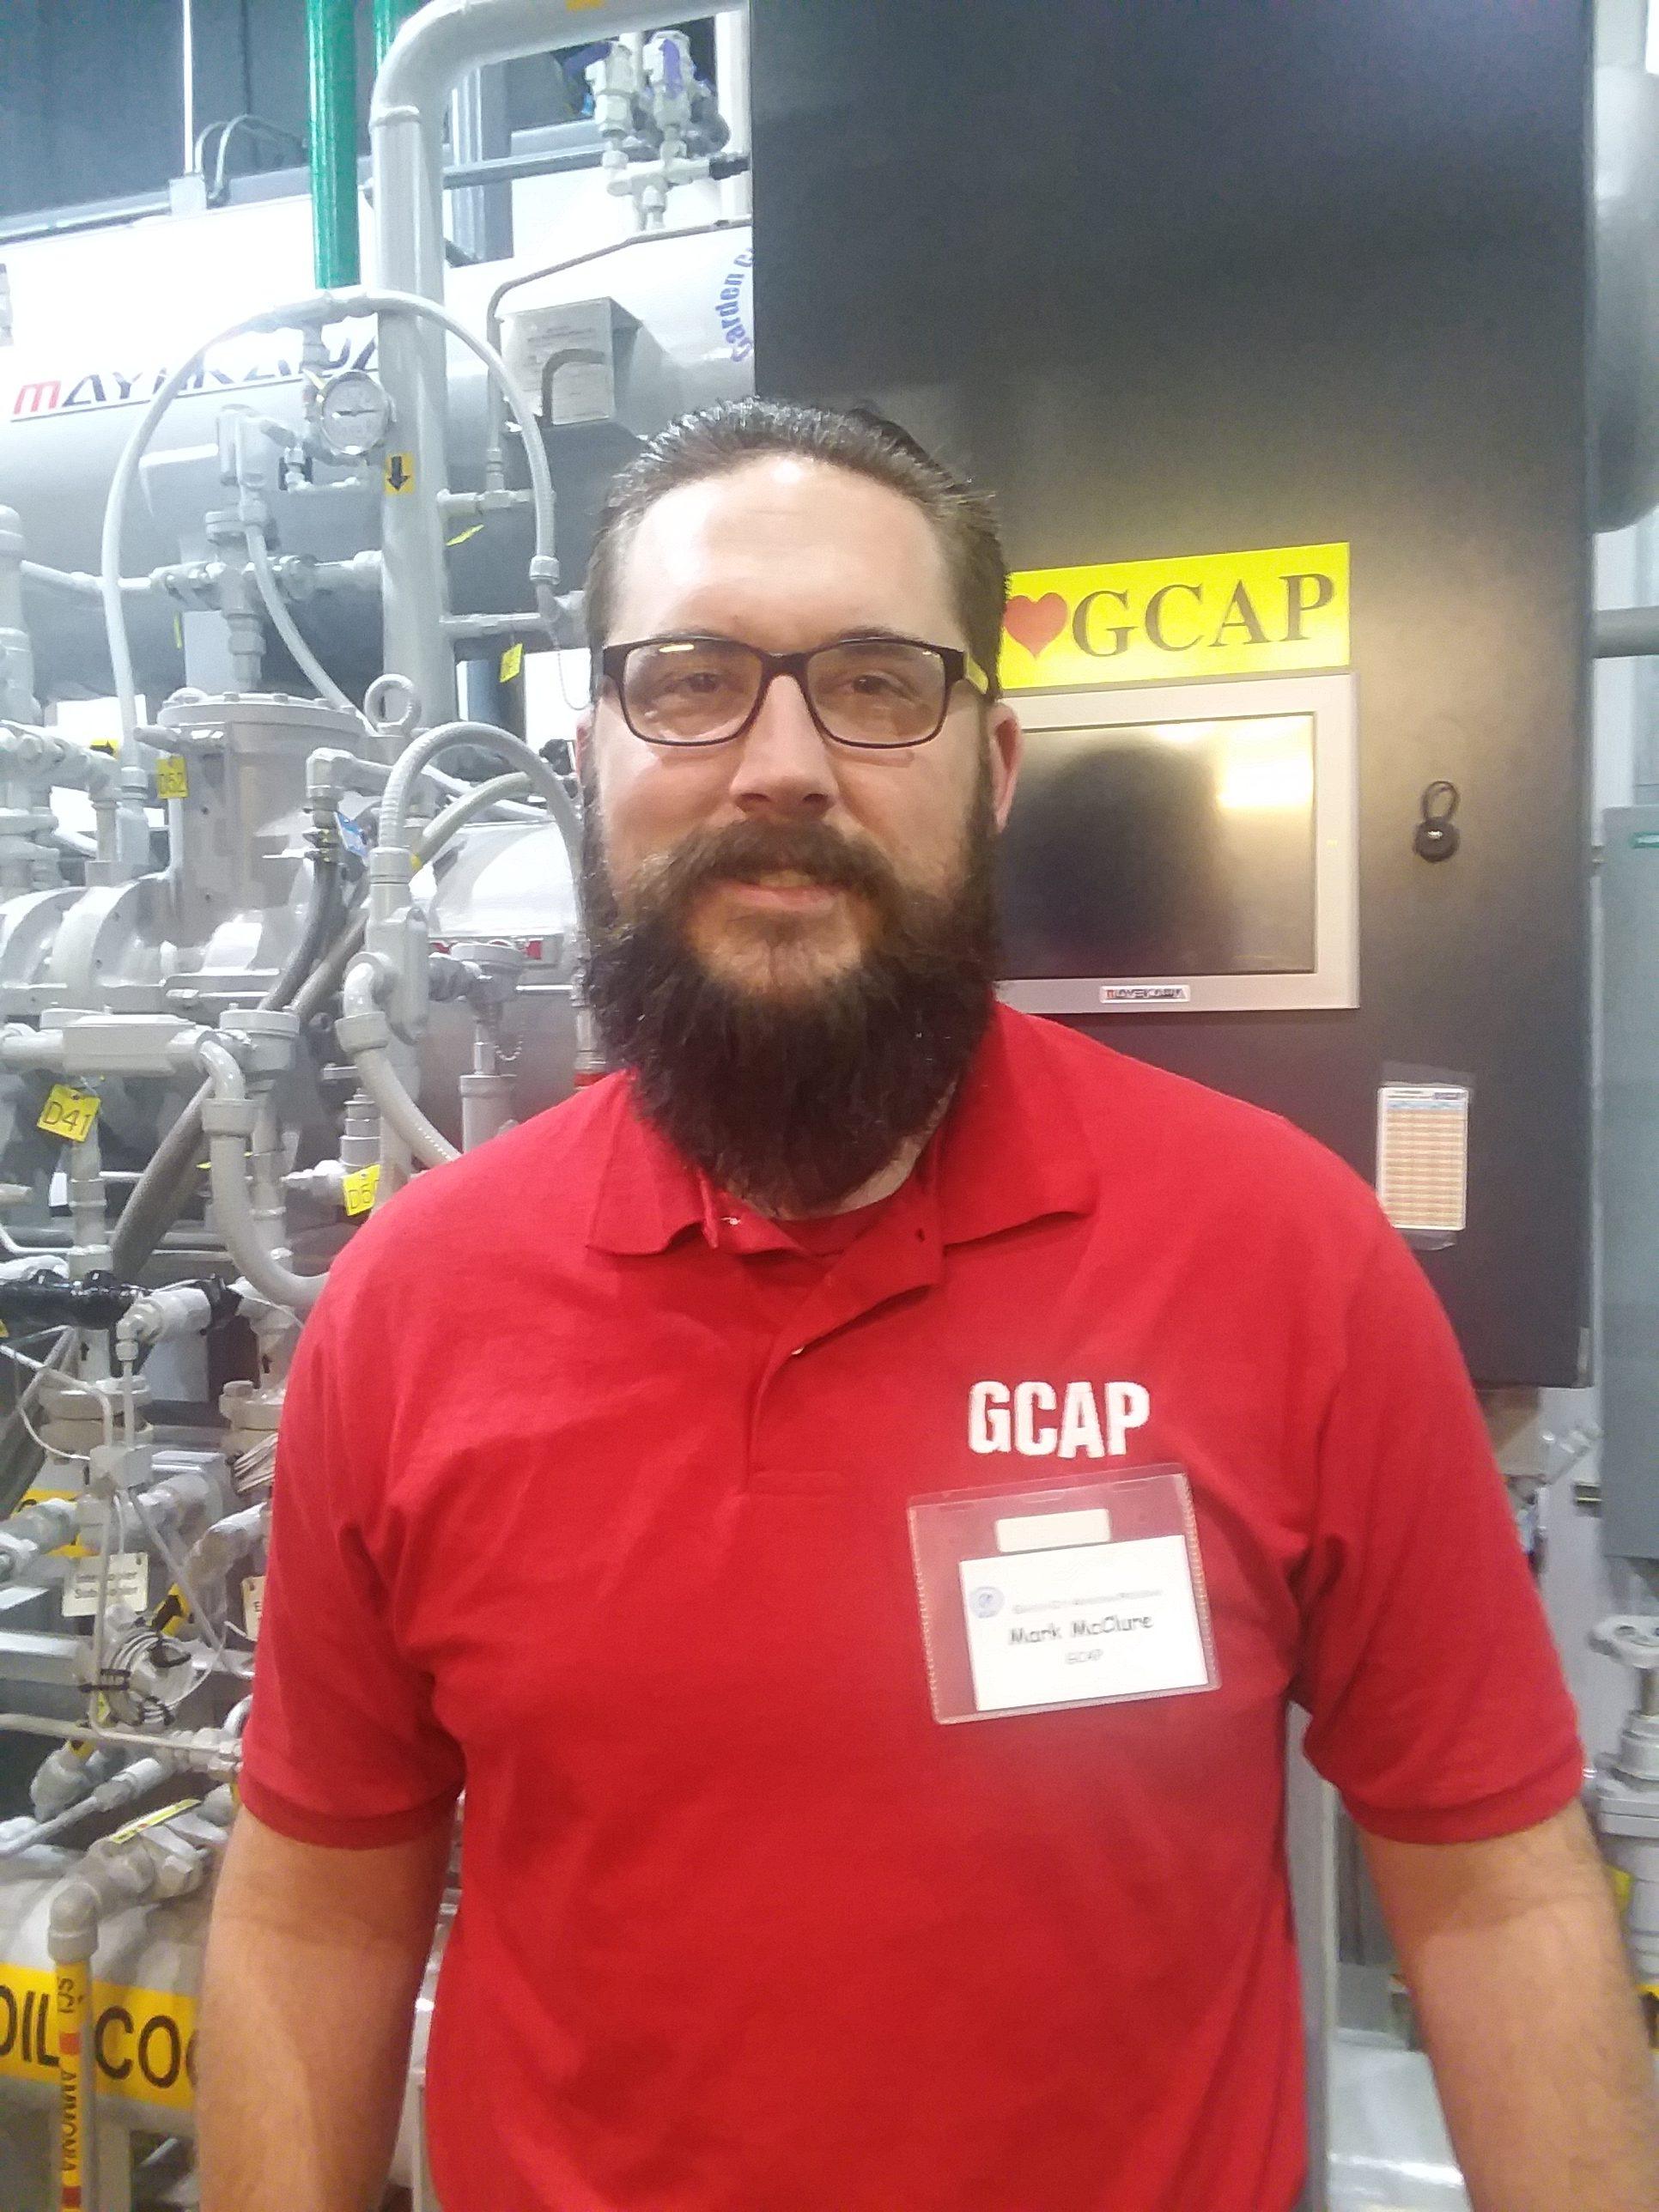 Mark McClure: New Intern @ GCAP!